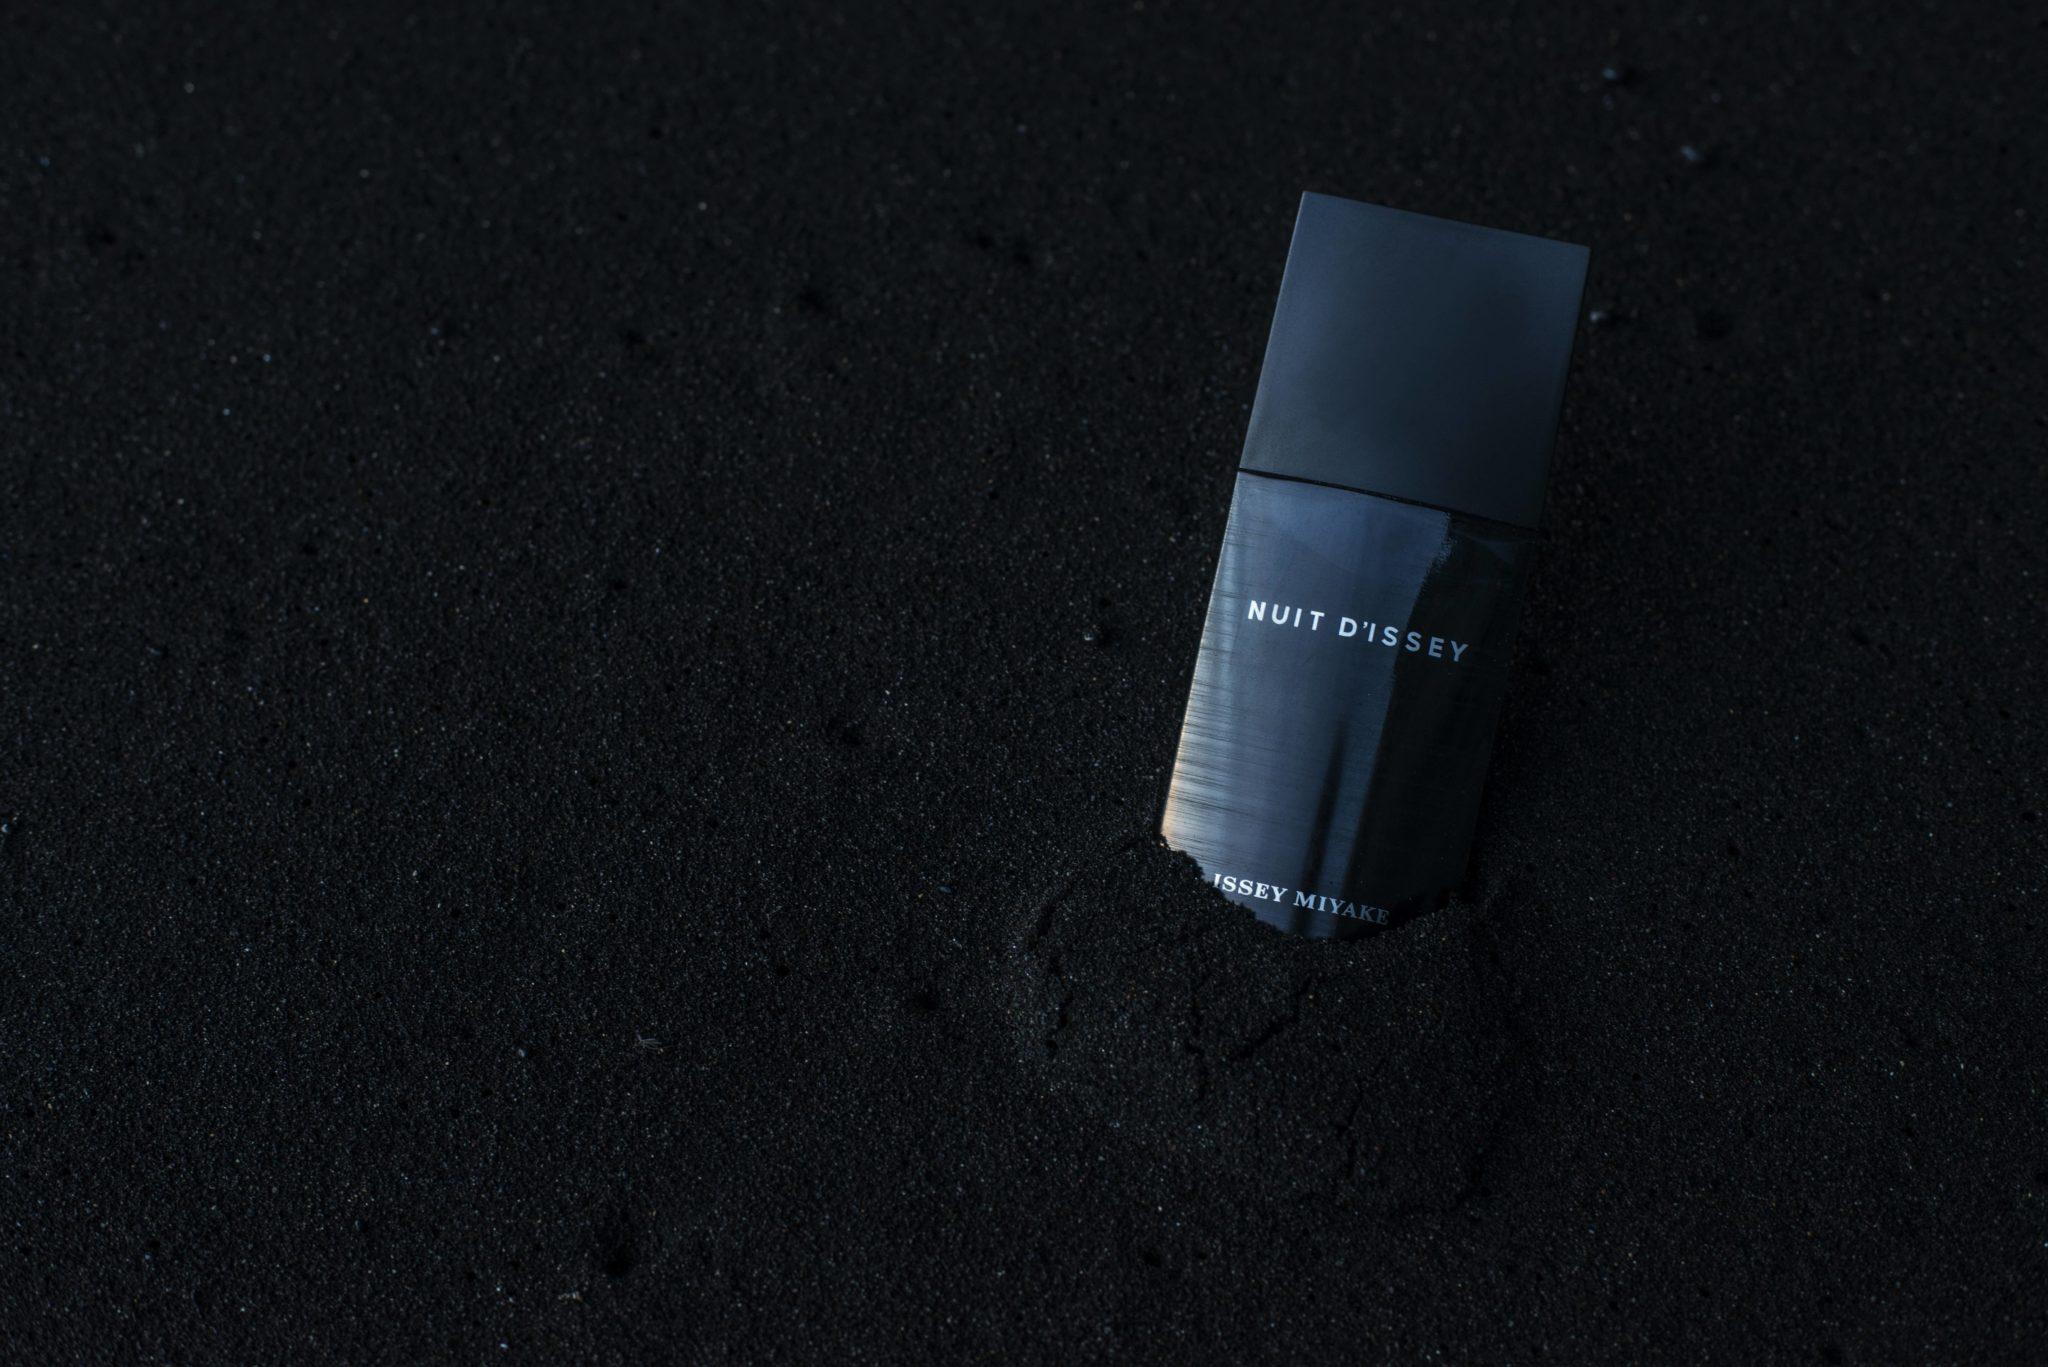 nuit-d-issey-parfum-issey-miyake